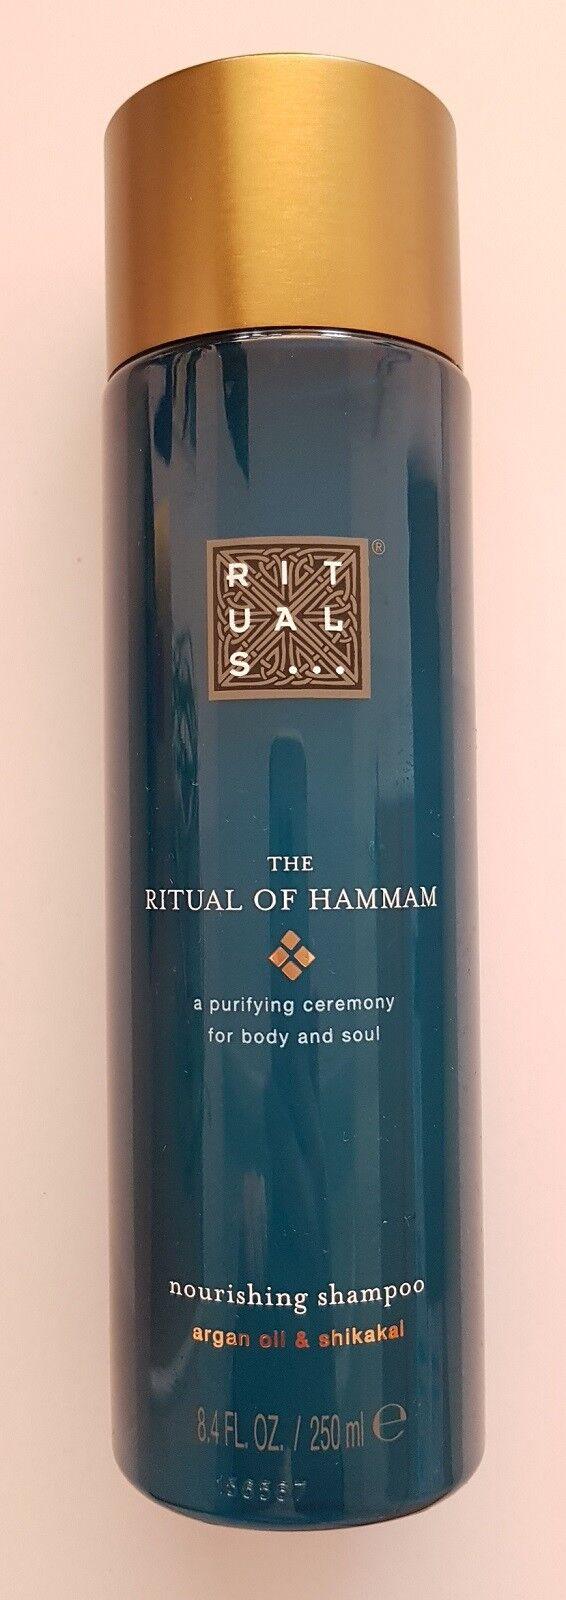 RITUALS * The Ritual of Hammam Shampoo * 250ml * PFLEGE Reinigung Arganöl Argan